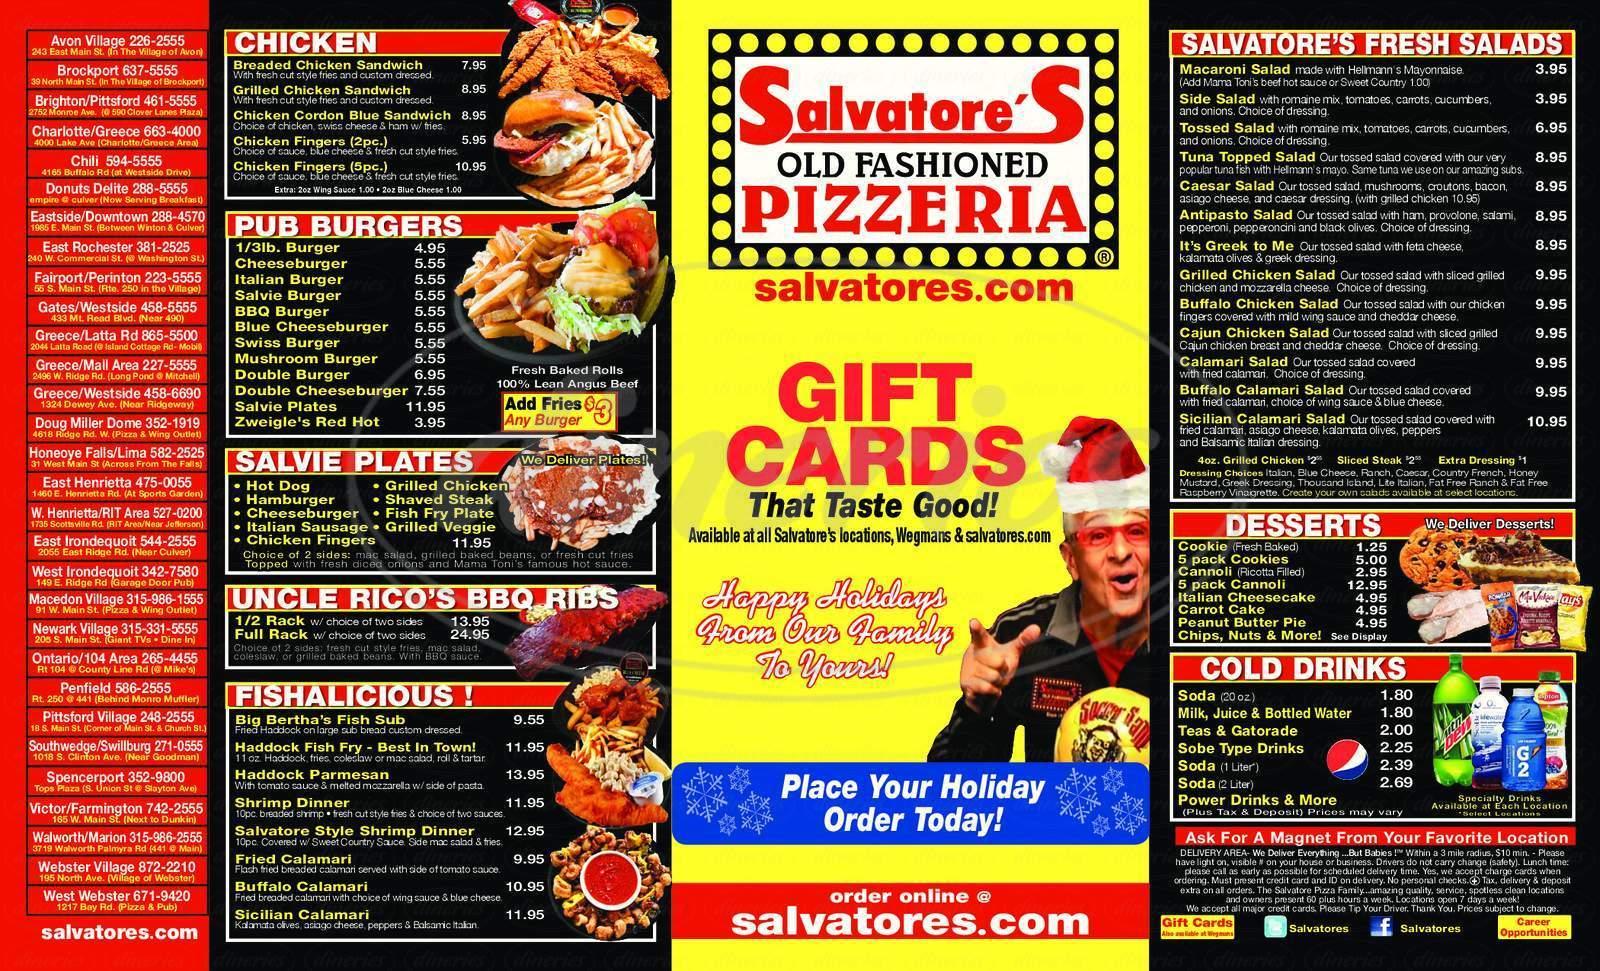 menu for Salvatore's Old Fashioned Pizzeria